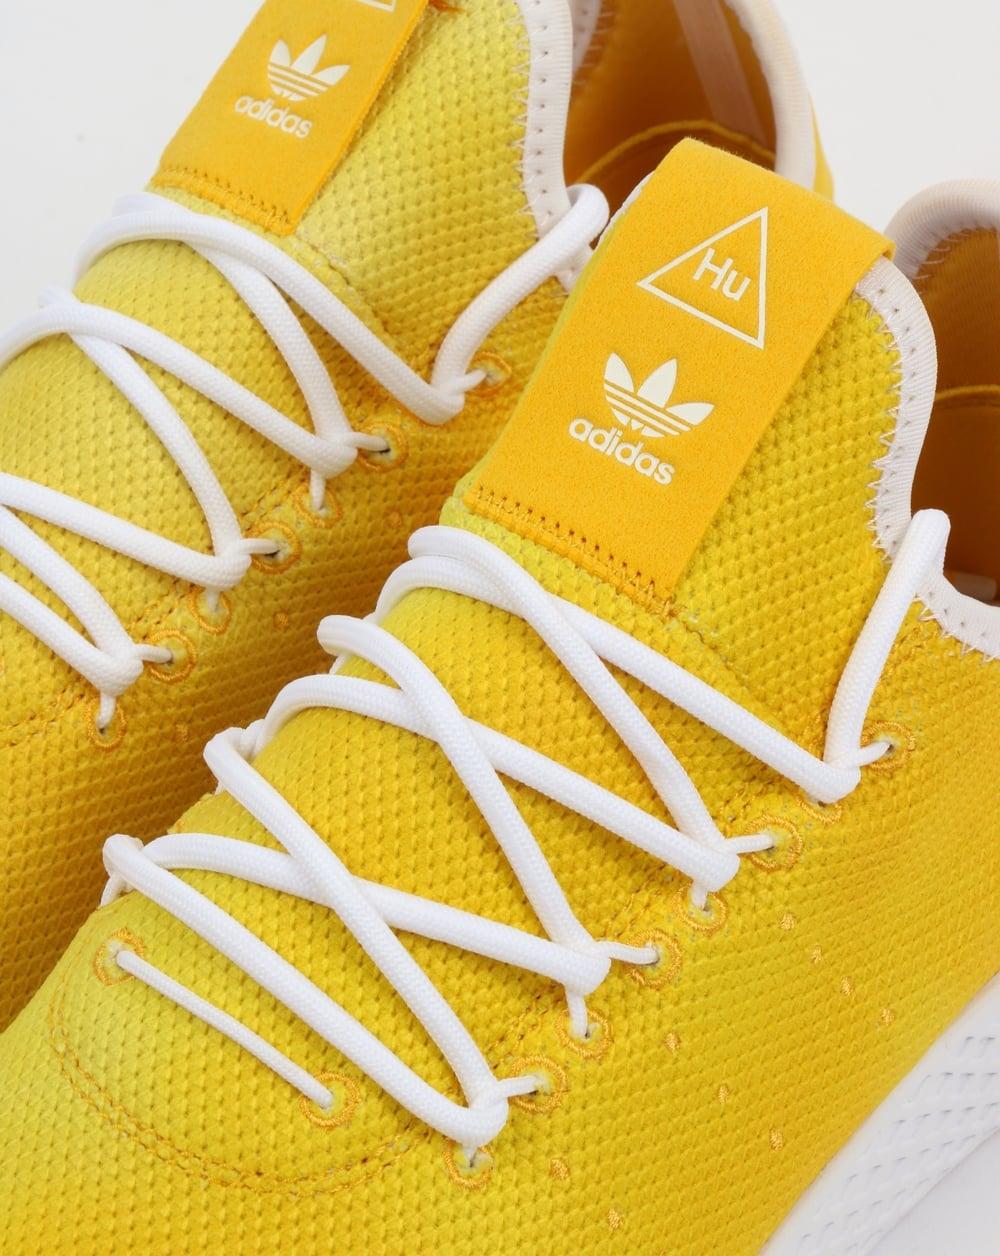 459dc02c50a34 Adidas PW HU Holi Tennis Trainers Yellow White